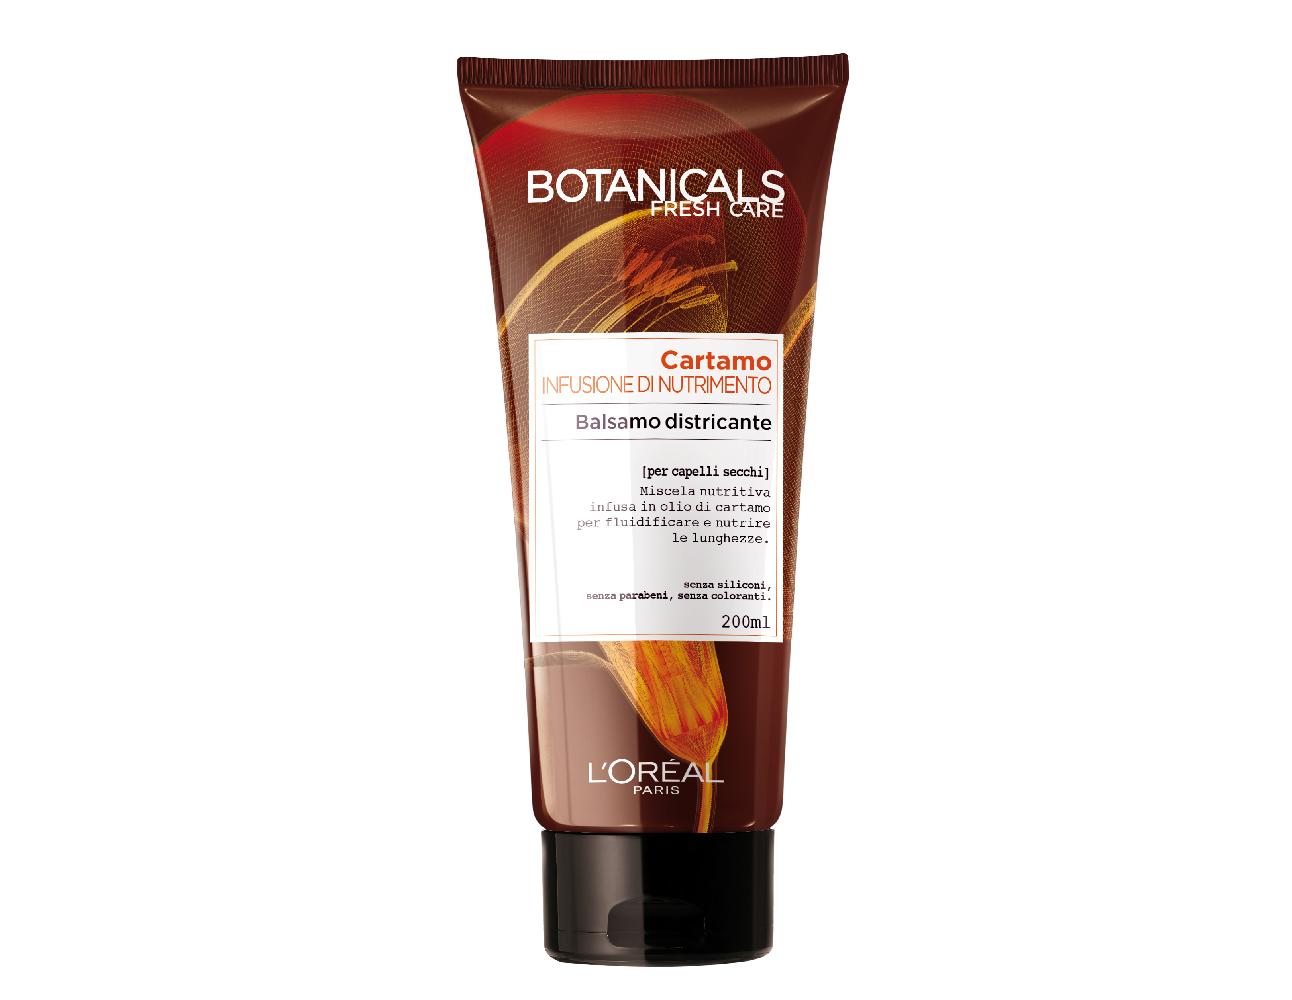 Image of Botanicals Fresh Care Balsamo Nutriente con Olio di Cartamo 200ml